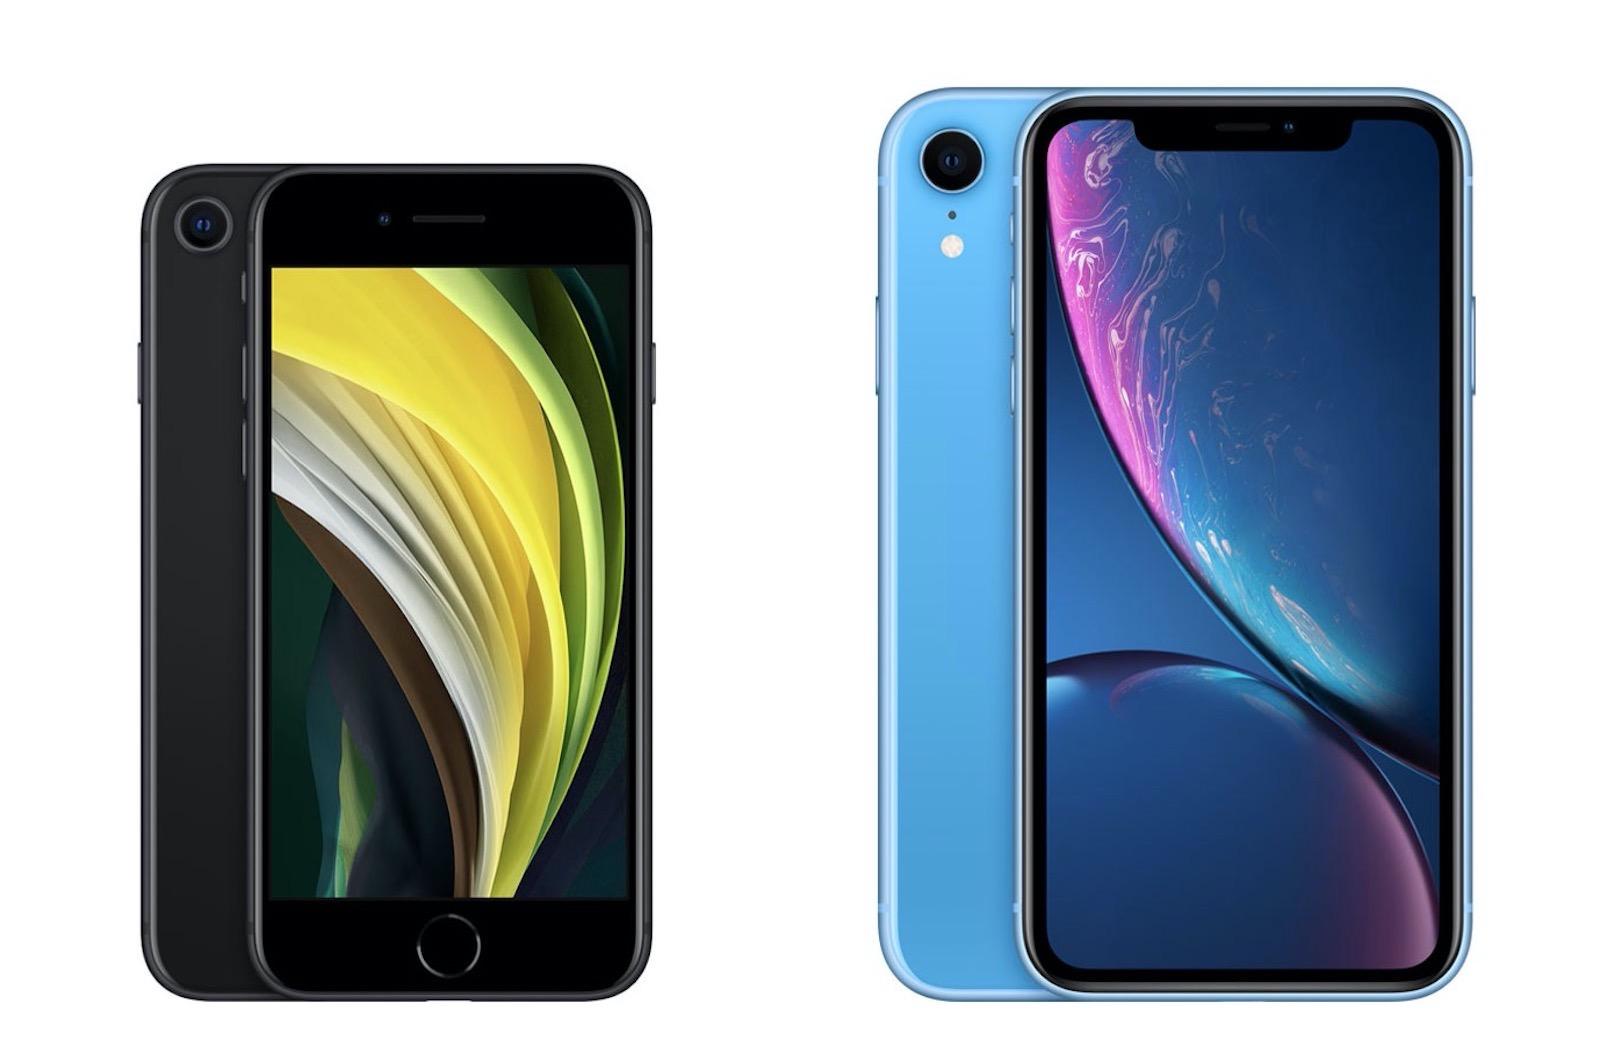 Iphone se vs iphonexr